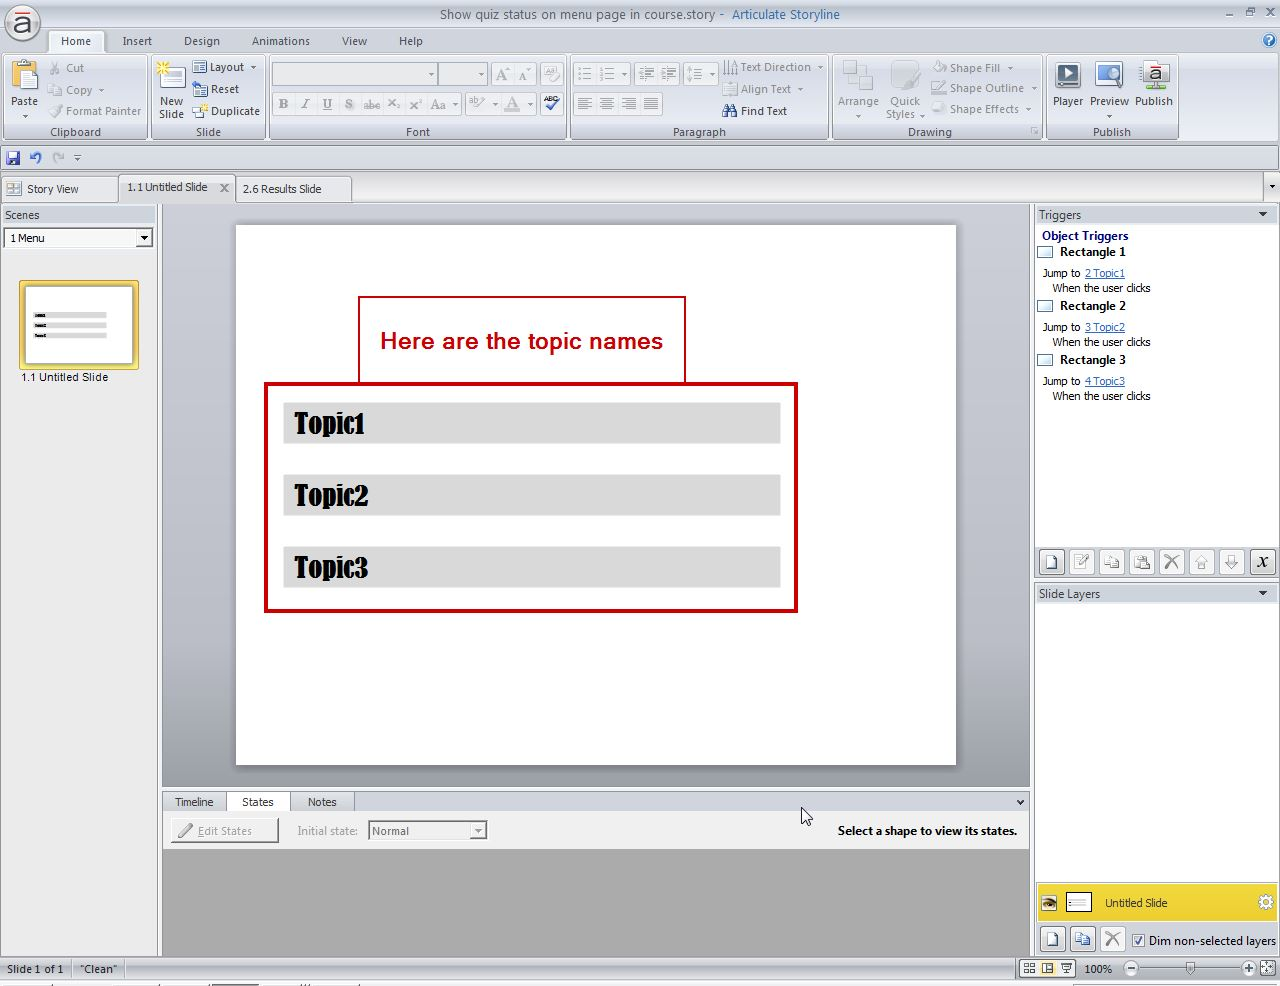 Create a menu page